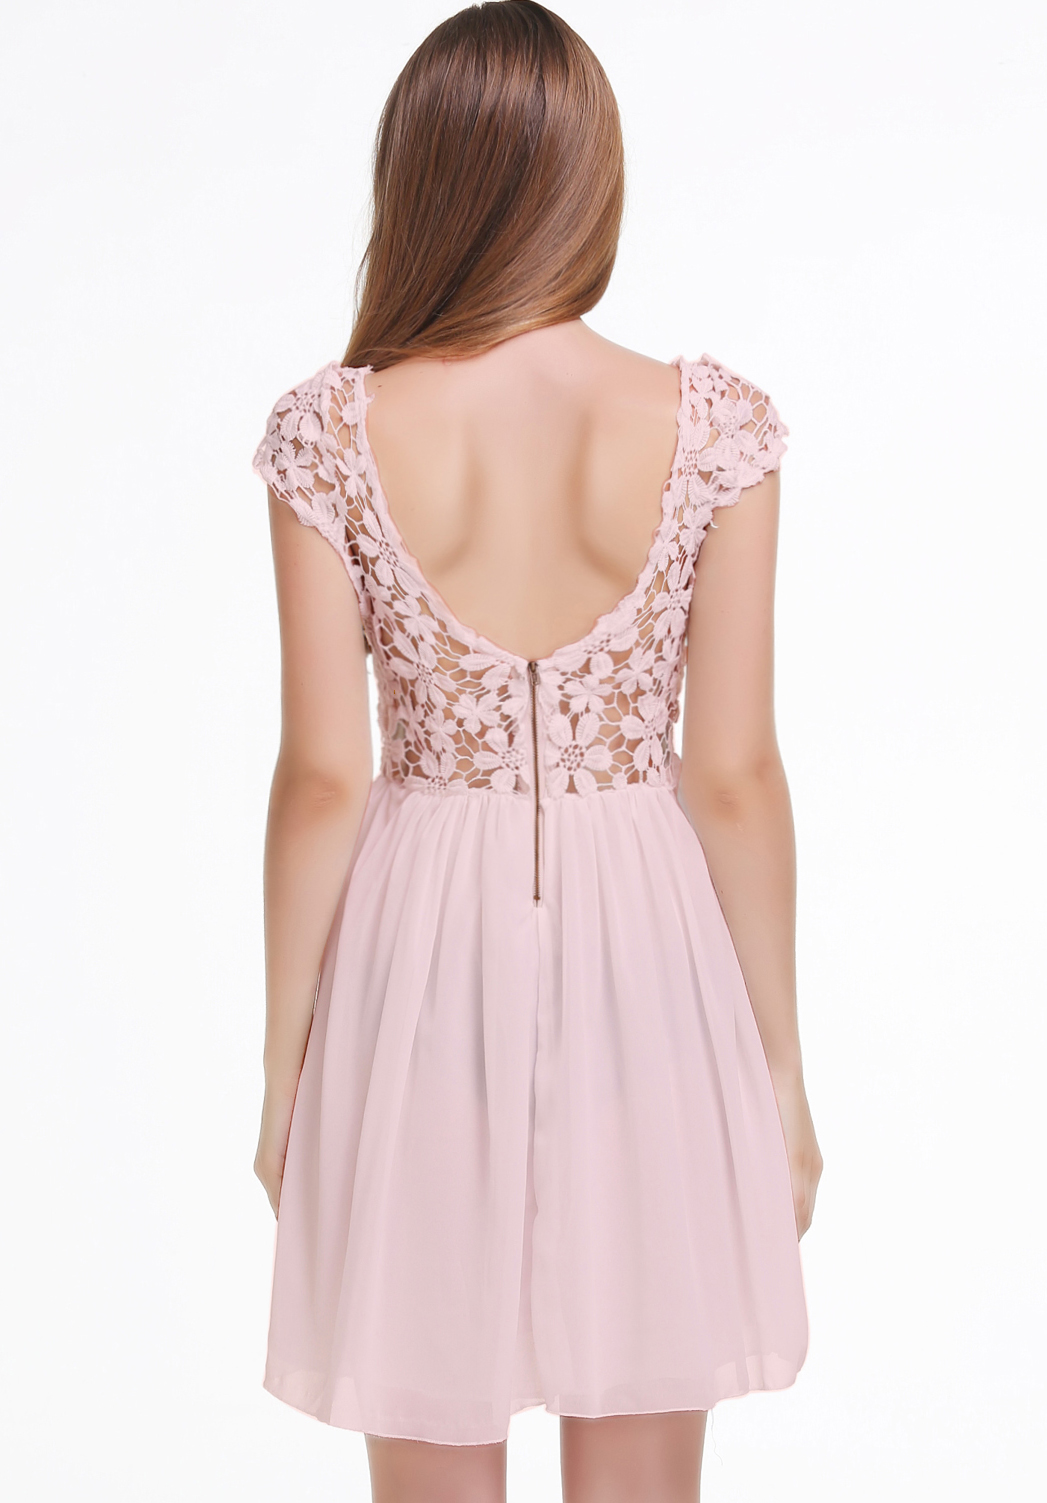 plissiertes Kleid mit all-over Häkelspitze, rosa-Sheinside